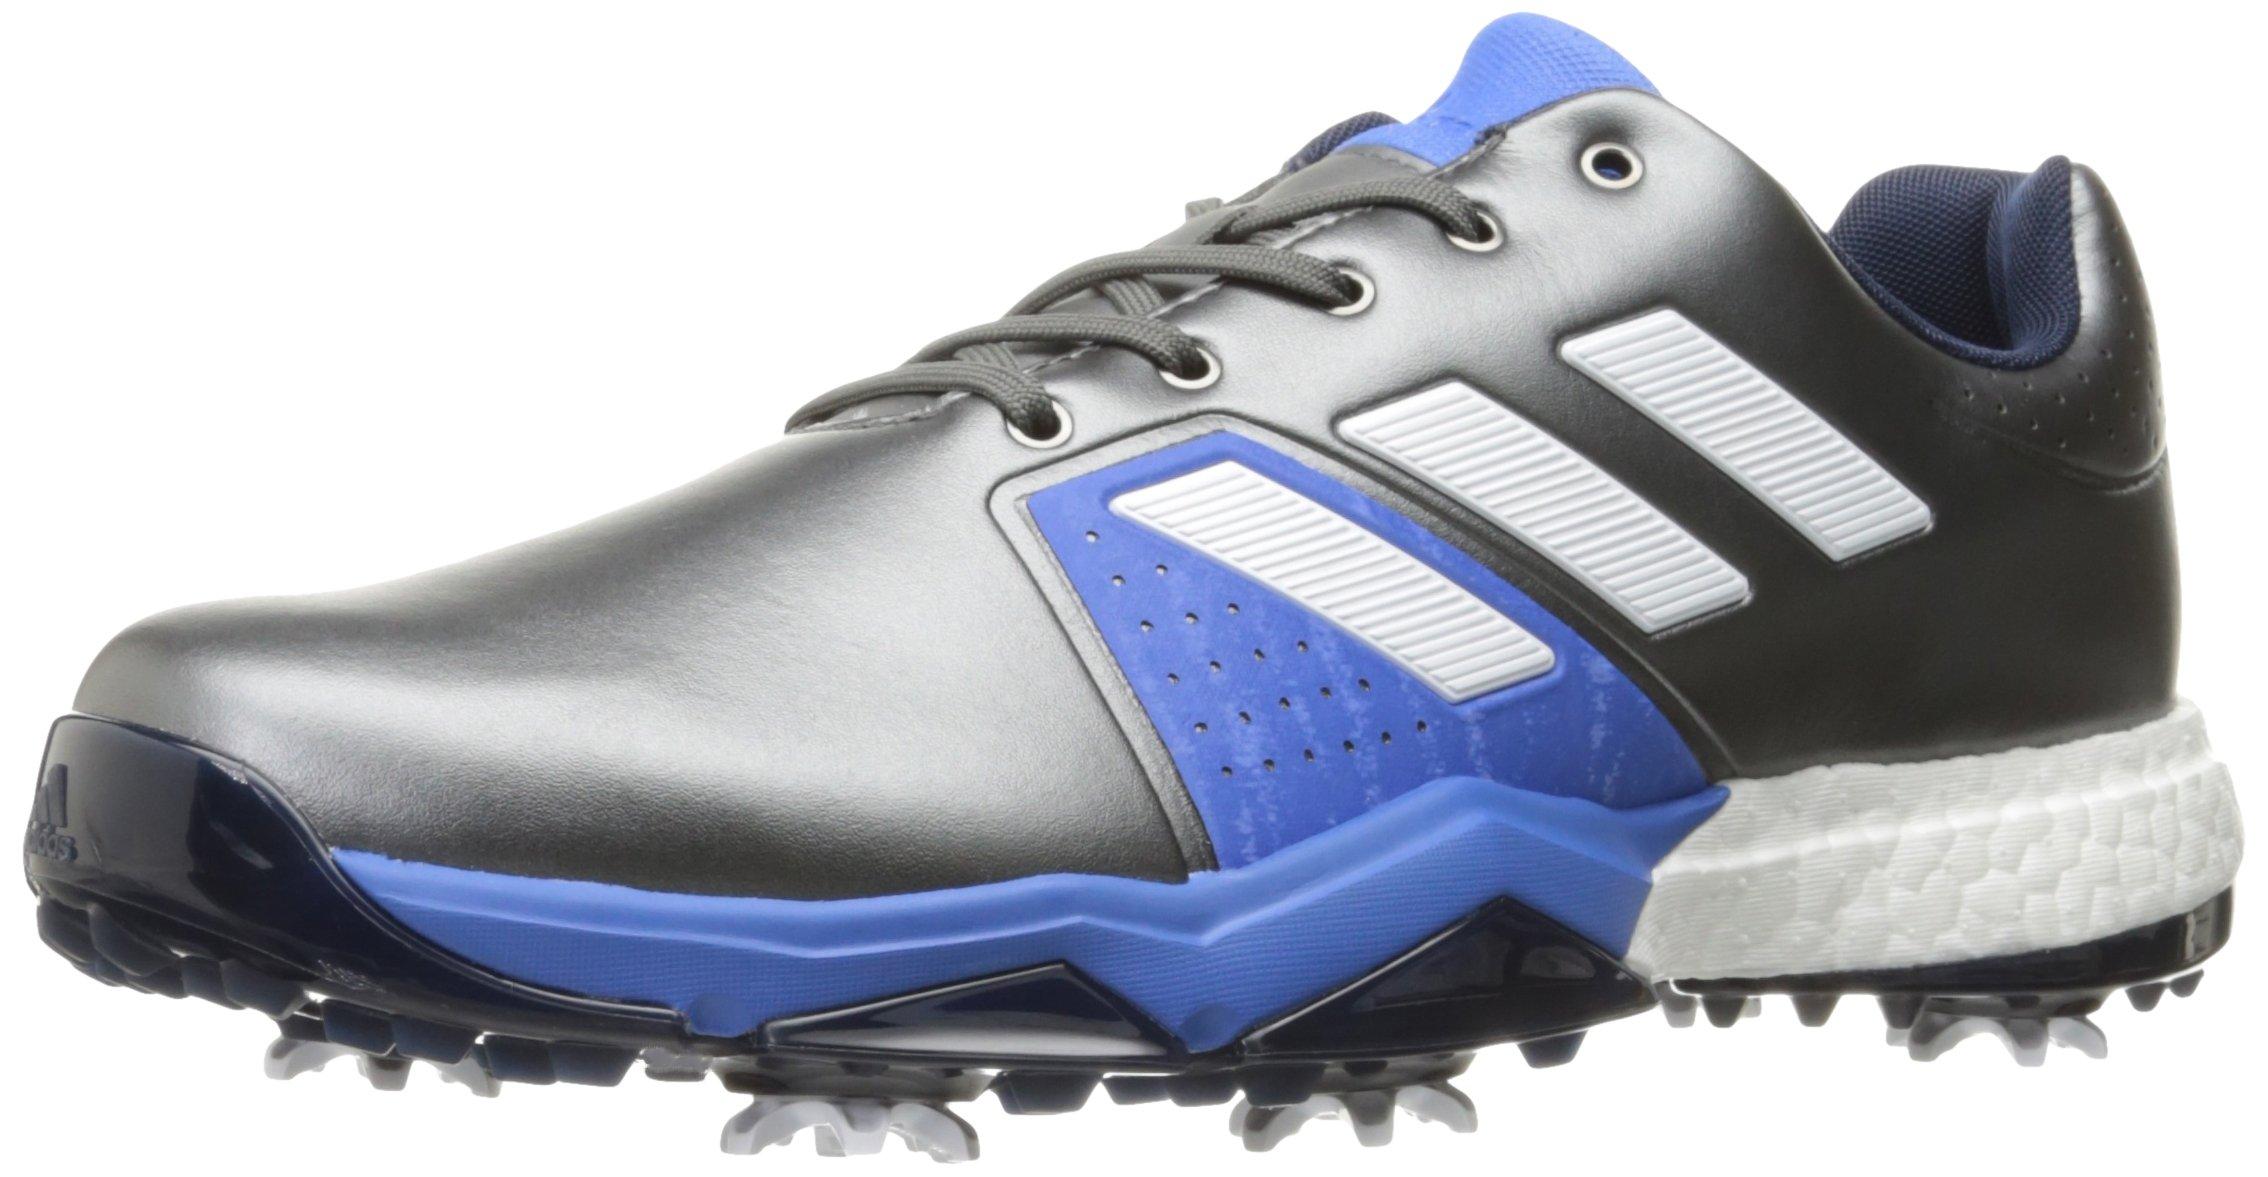 adidas Men's Adipower Boost 3 WD Golf Shoe, Dark Silver Metallic/White/Blast Blue, 7.5 W US